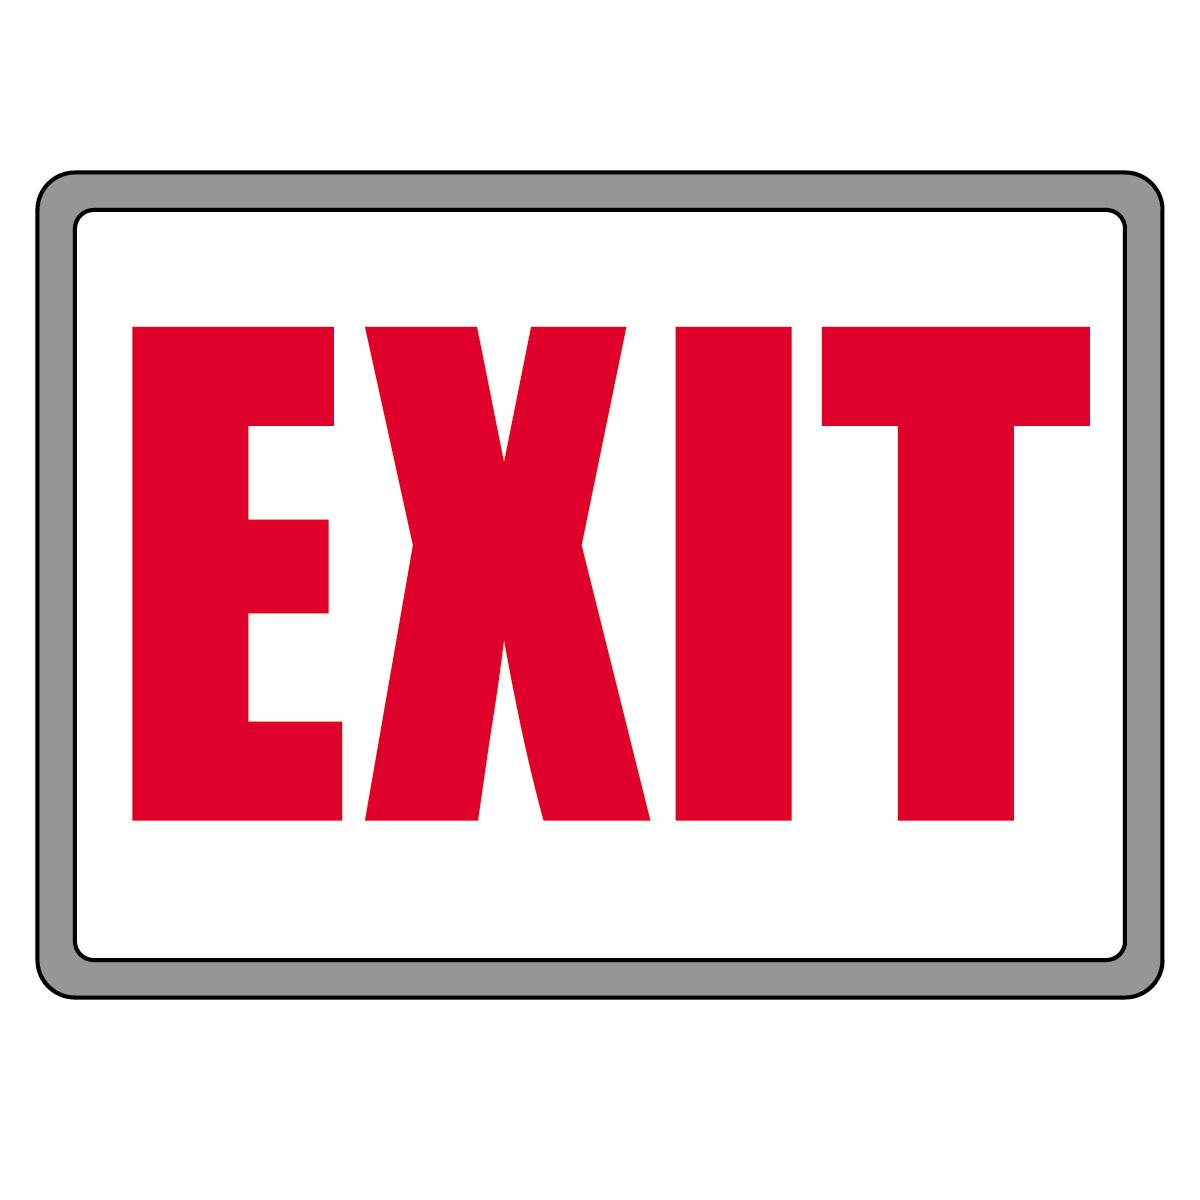 Us 41 signs clipart clip download Exit Icon Clip Art Download - Clip Art Library clip download